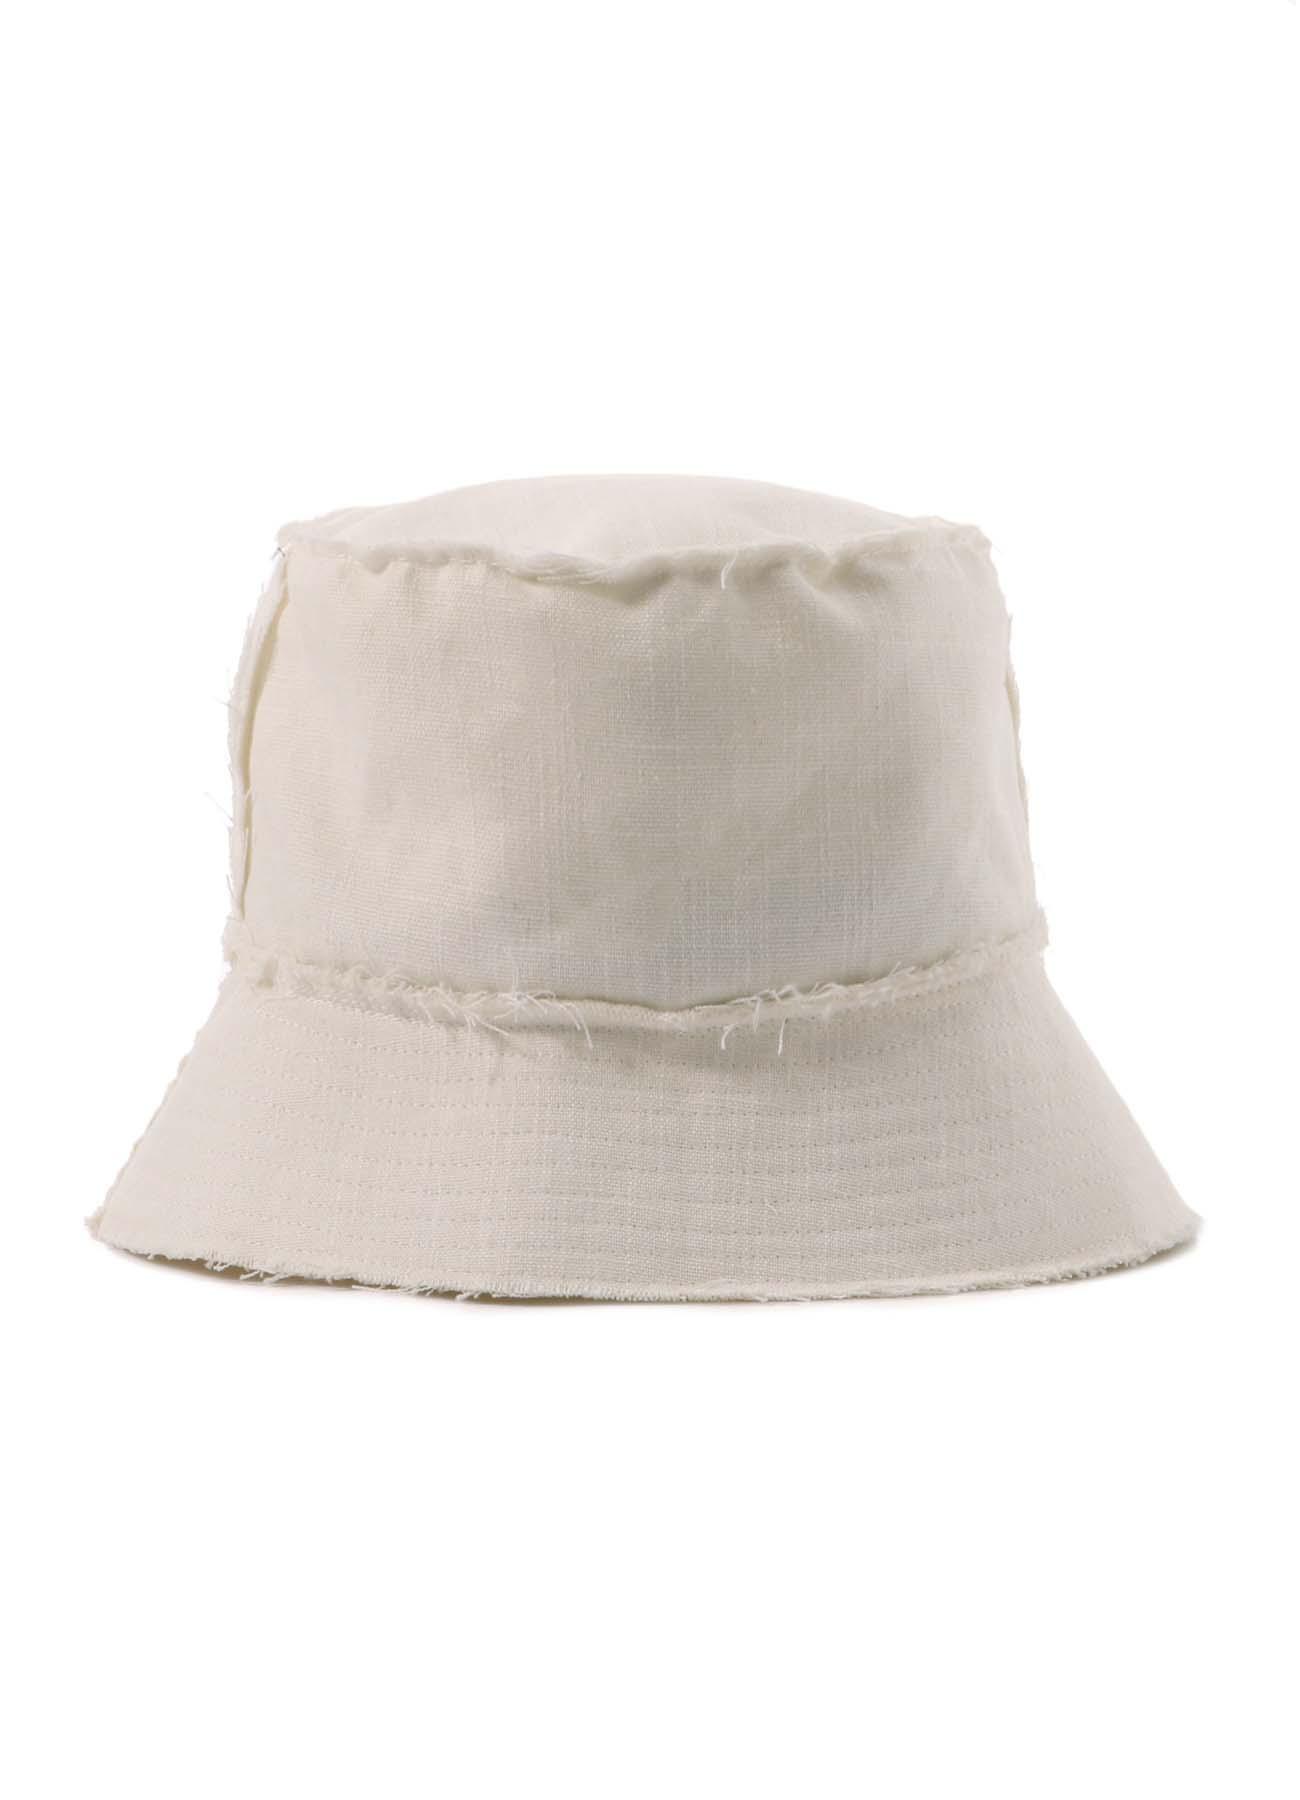 Indian Kadi Bucket Hat